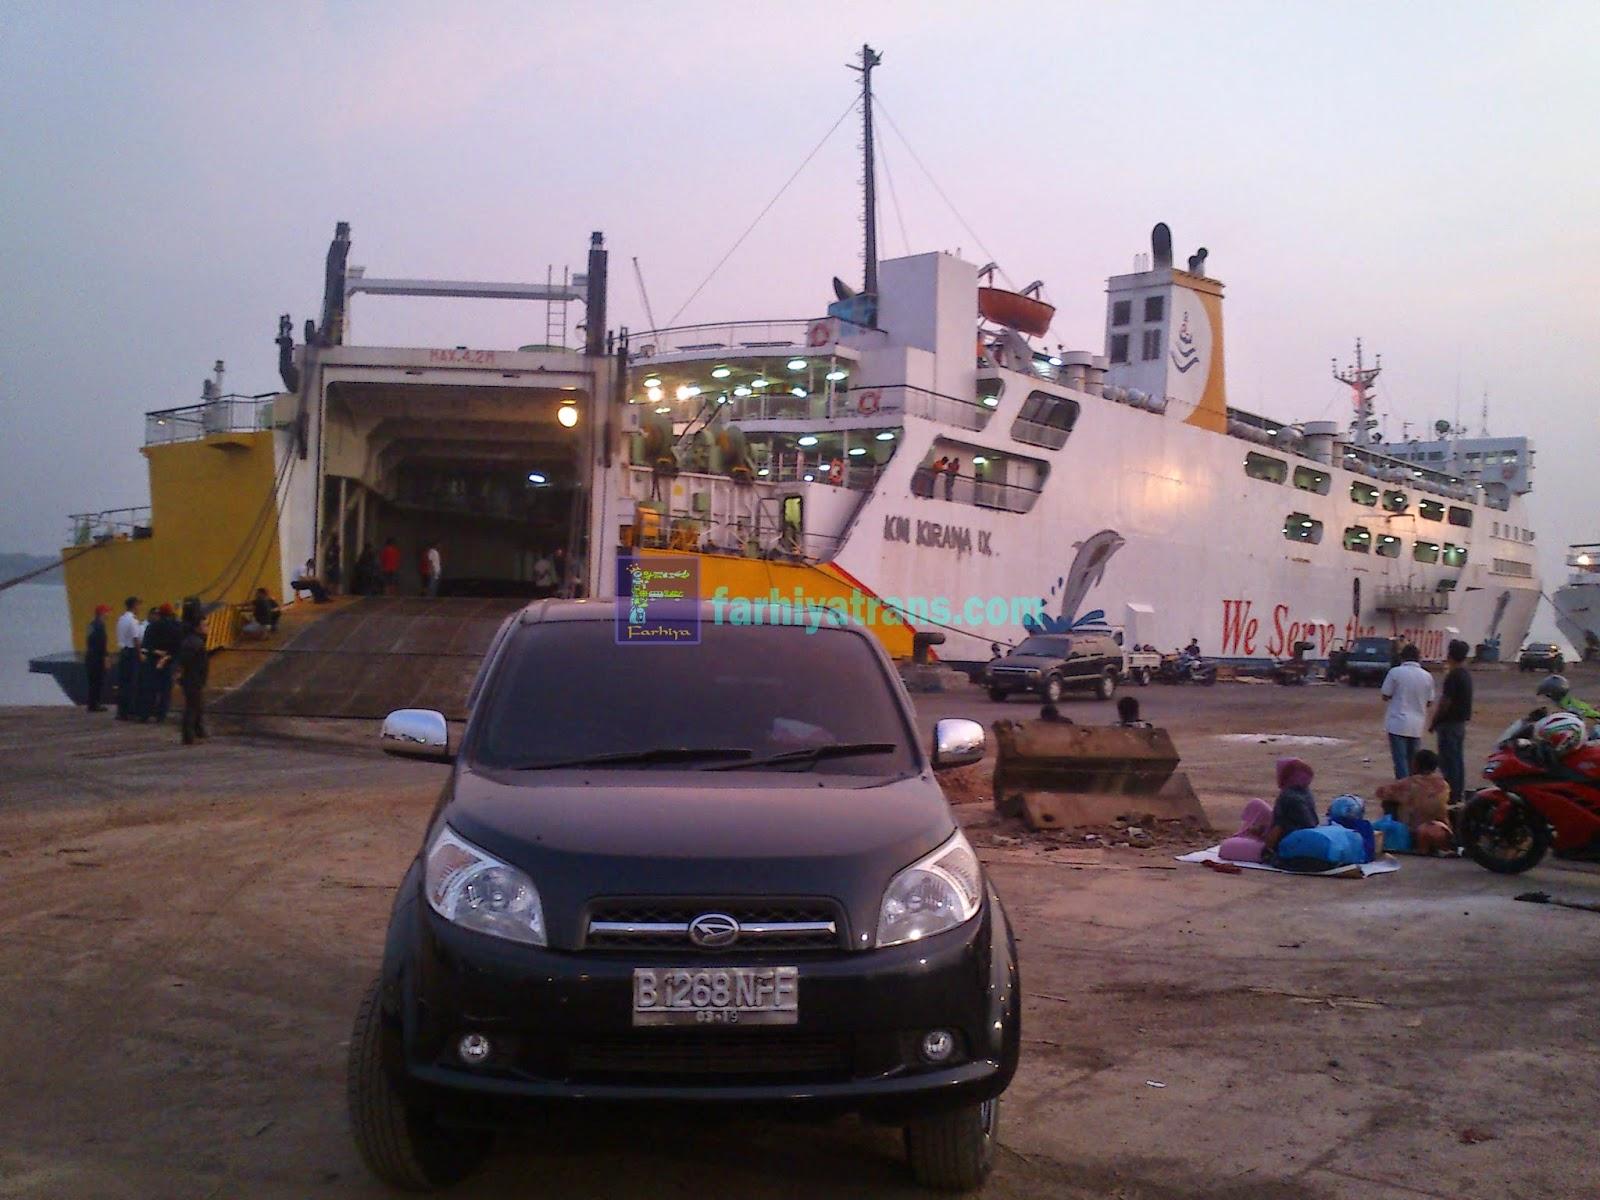 Pengiriman Mobil Daihatsu Terios tujuan Surabaya-Batulicin dengan Kapal Roro